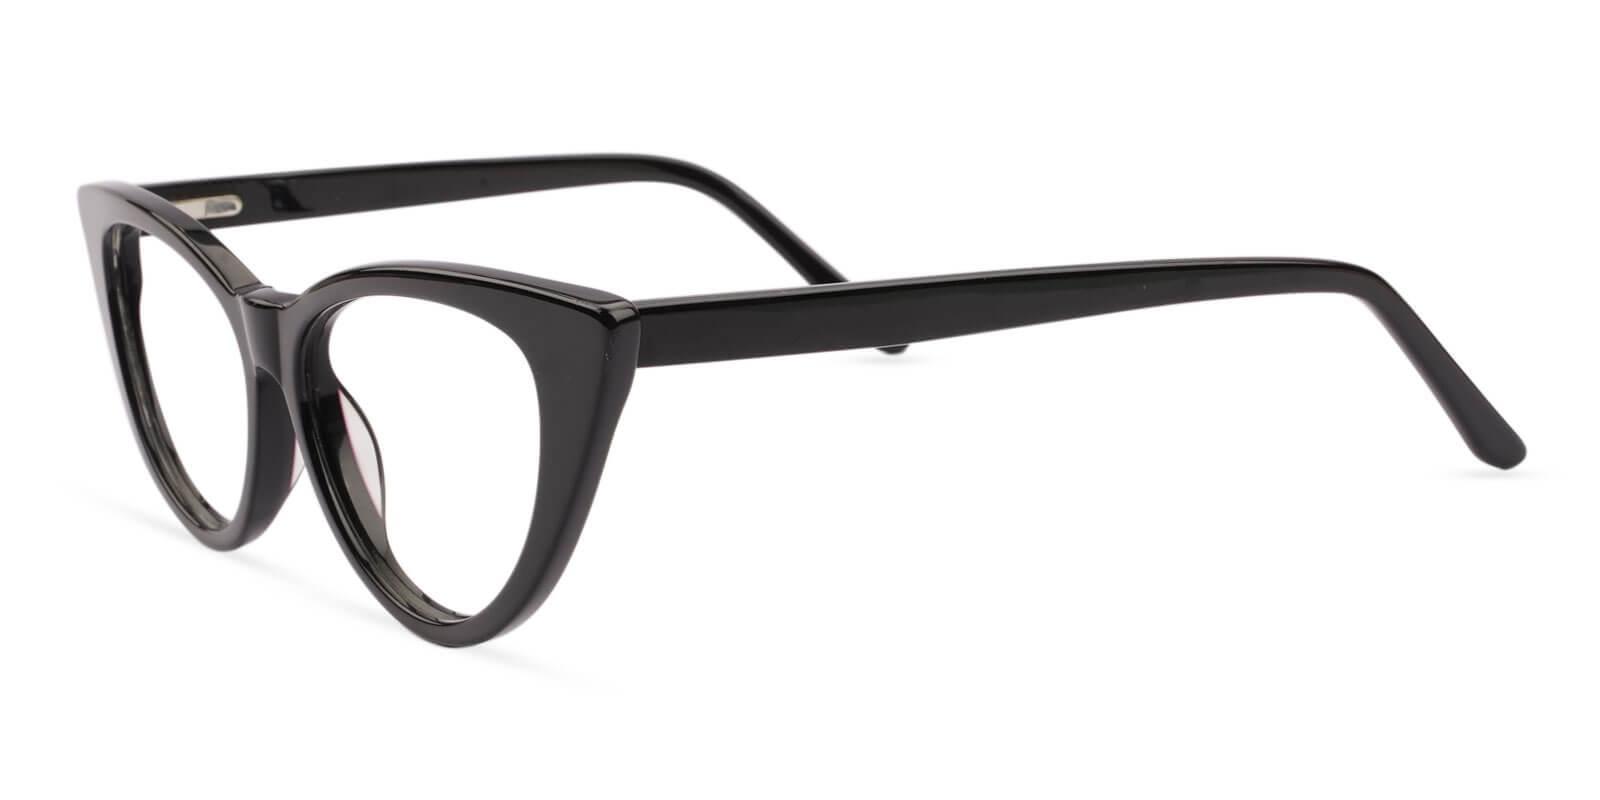 Nora Black Acetate Eyeglasses , SpringHinges , UniversalBridgeFit Frames from ABBE Glasses